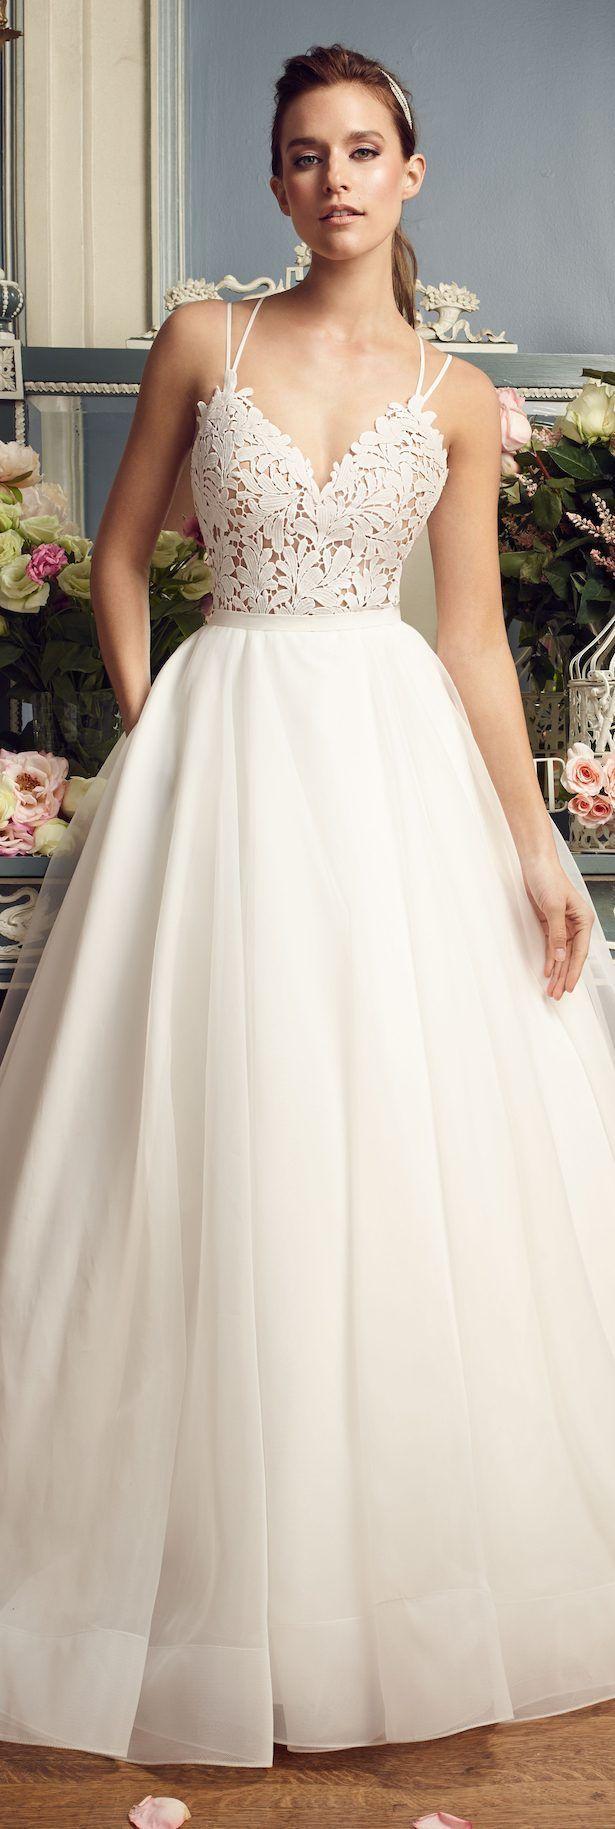 Mikaella Wedding Dress Collection Fall 2017 #2734880 - Weddbook